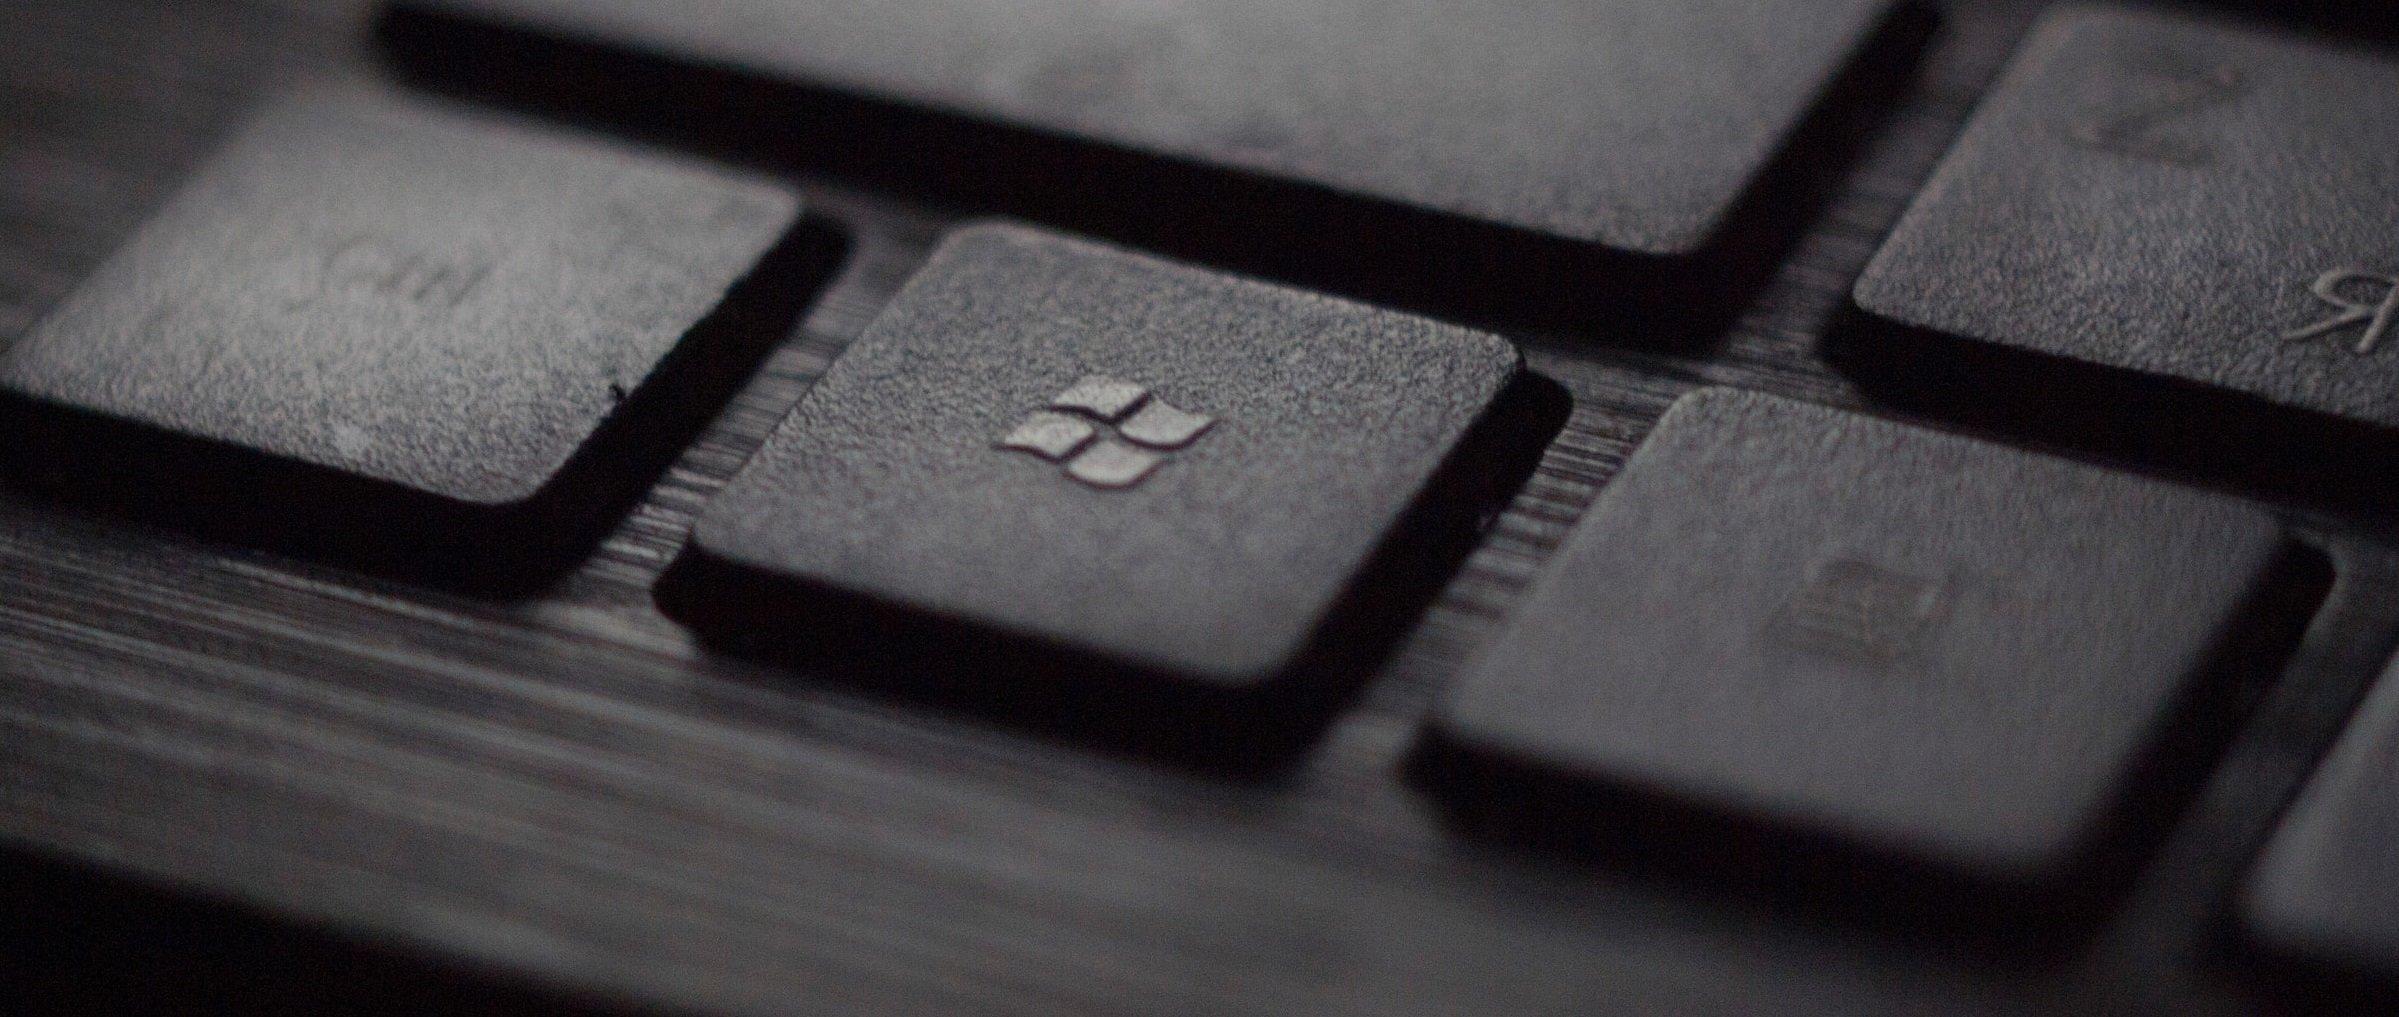 microsoft-windows-key